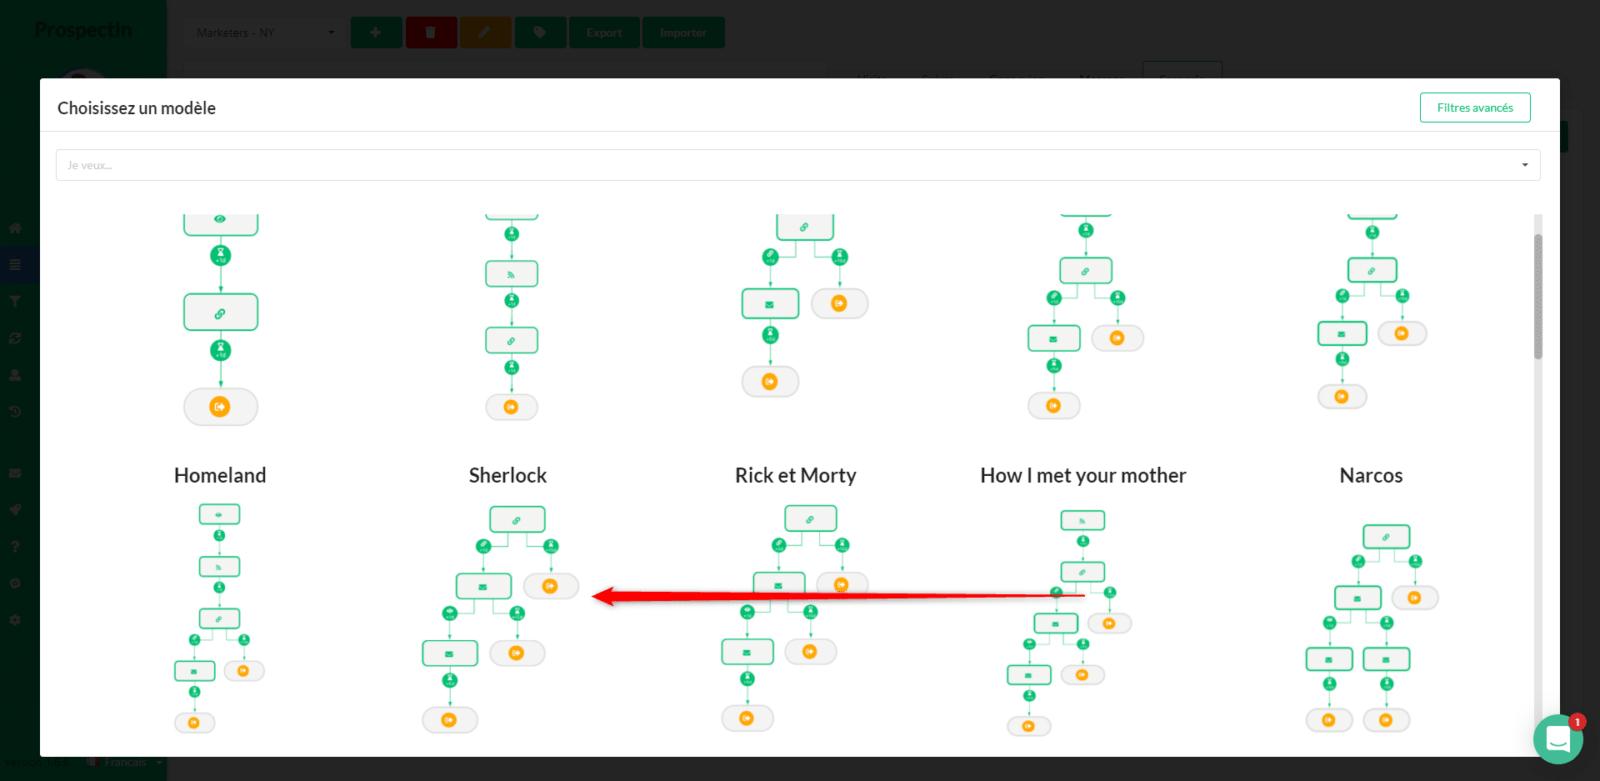 création de scénario sur LinkedIn